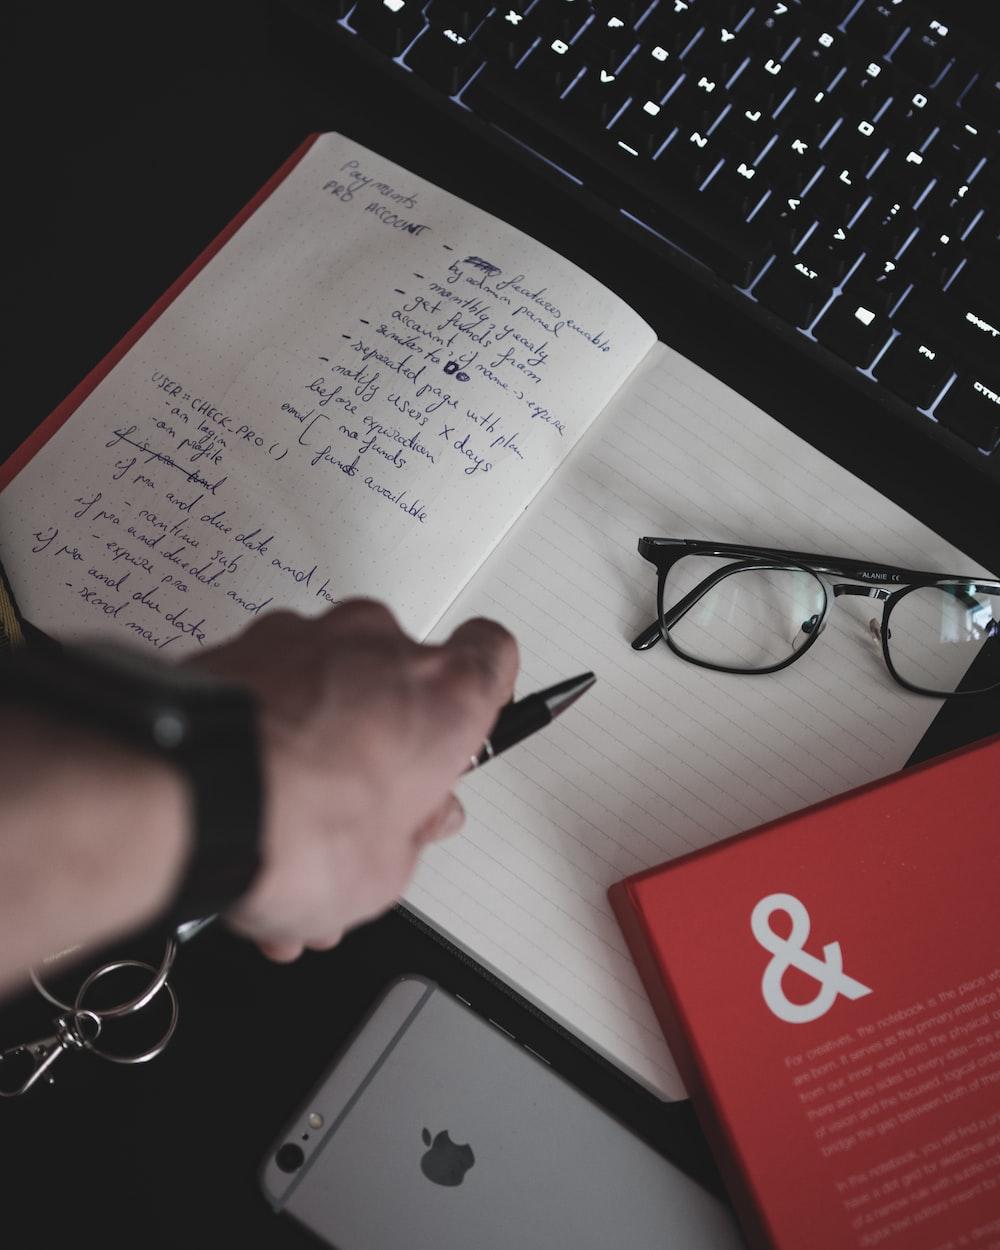 eyeglasses on white notebook